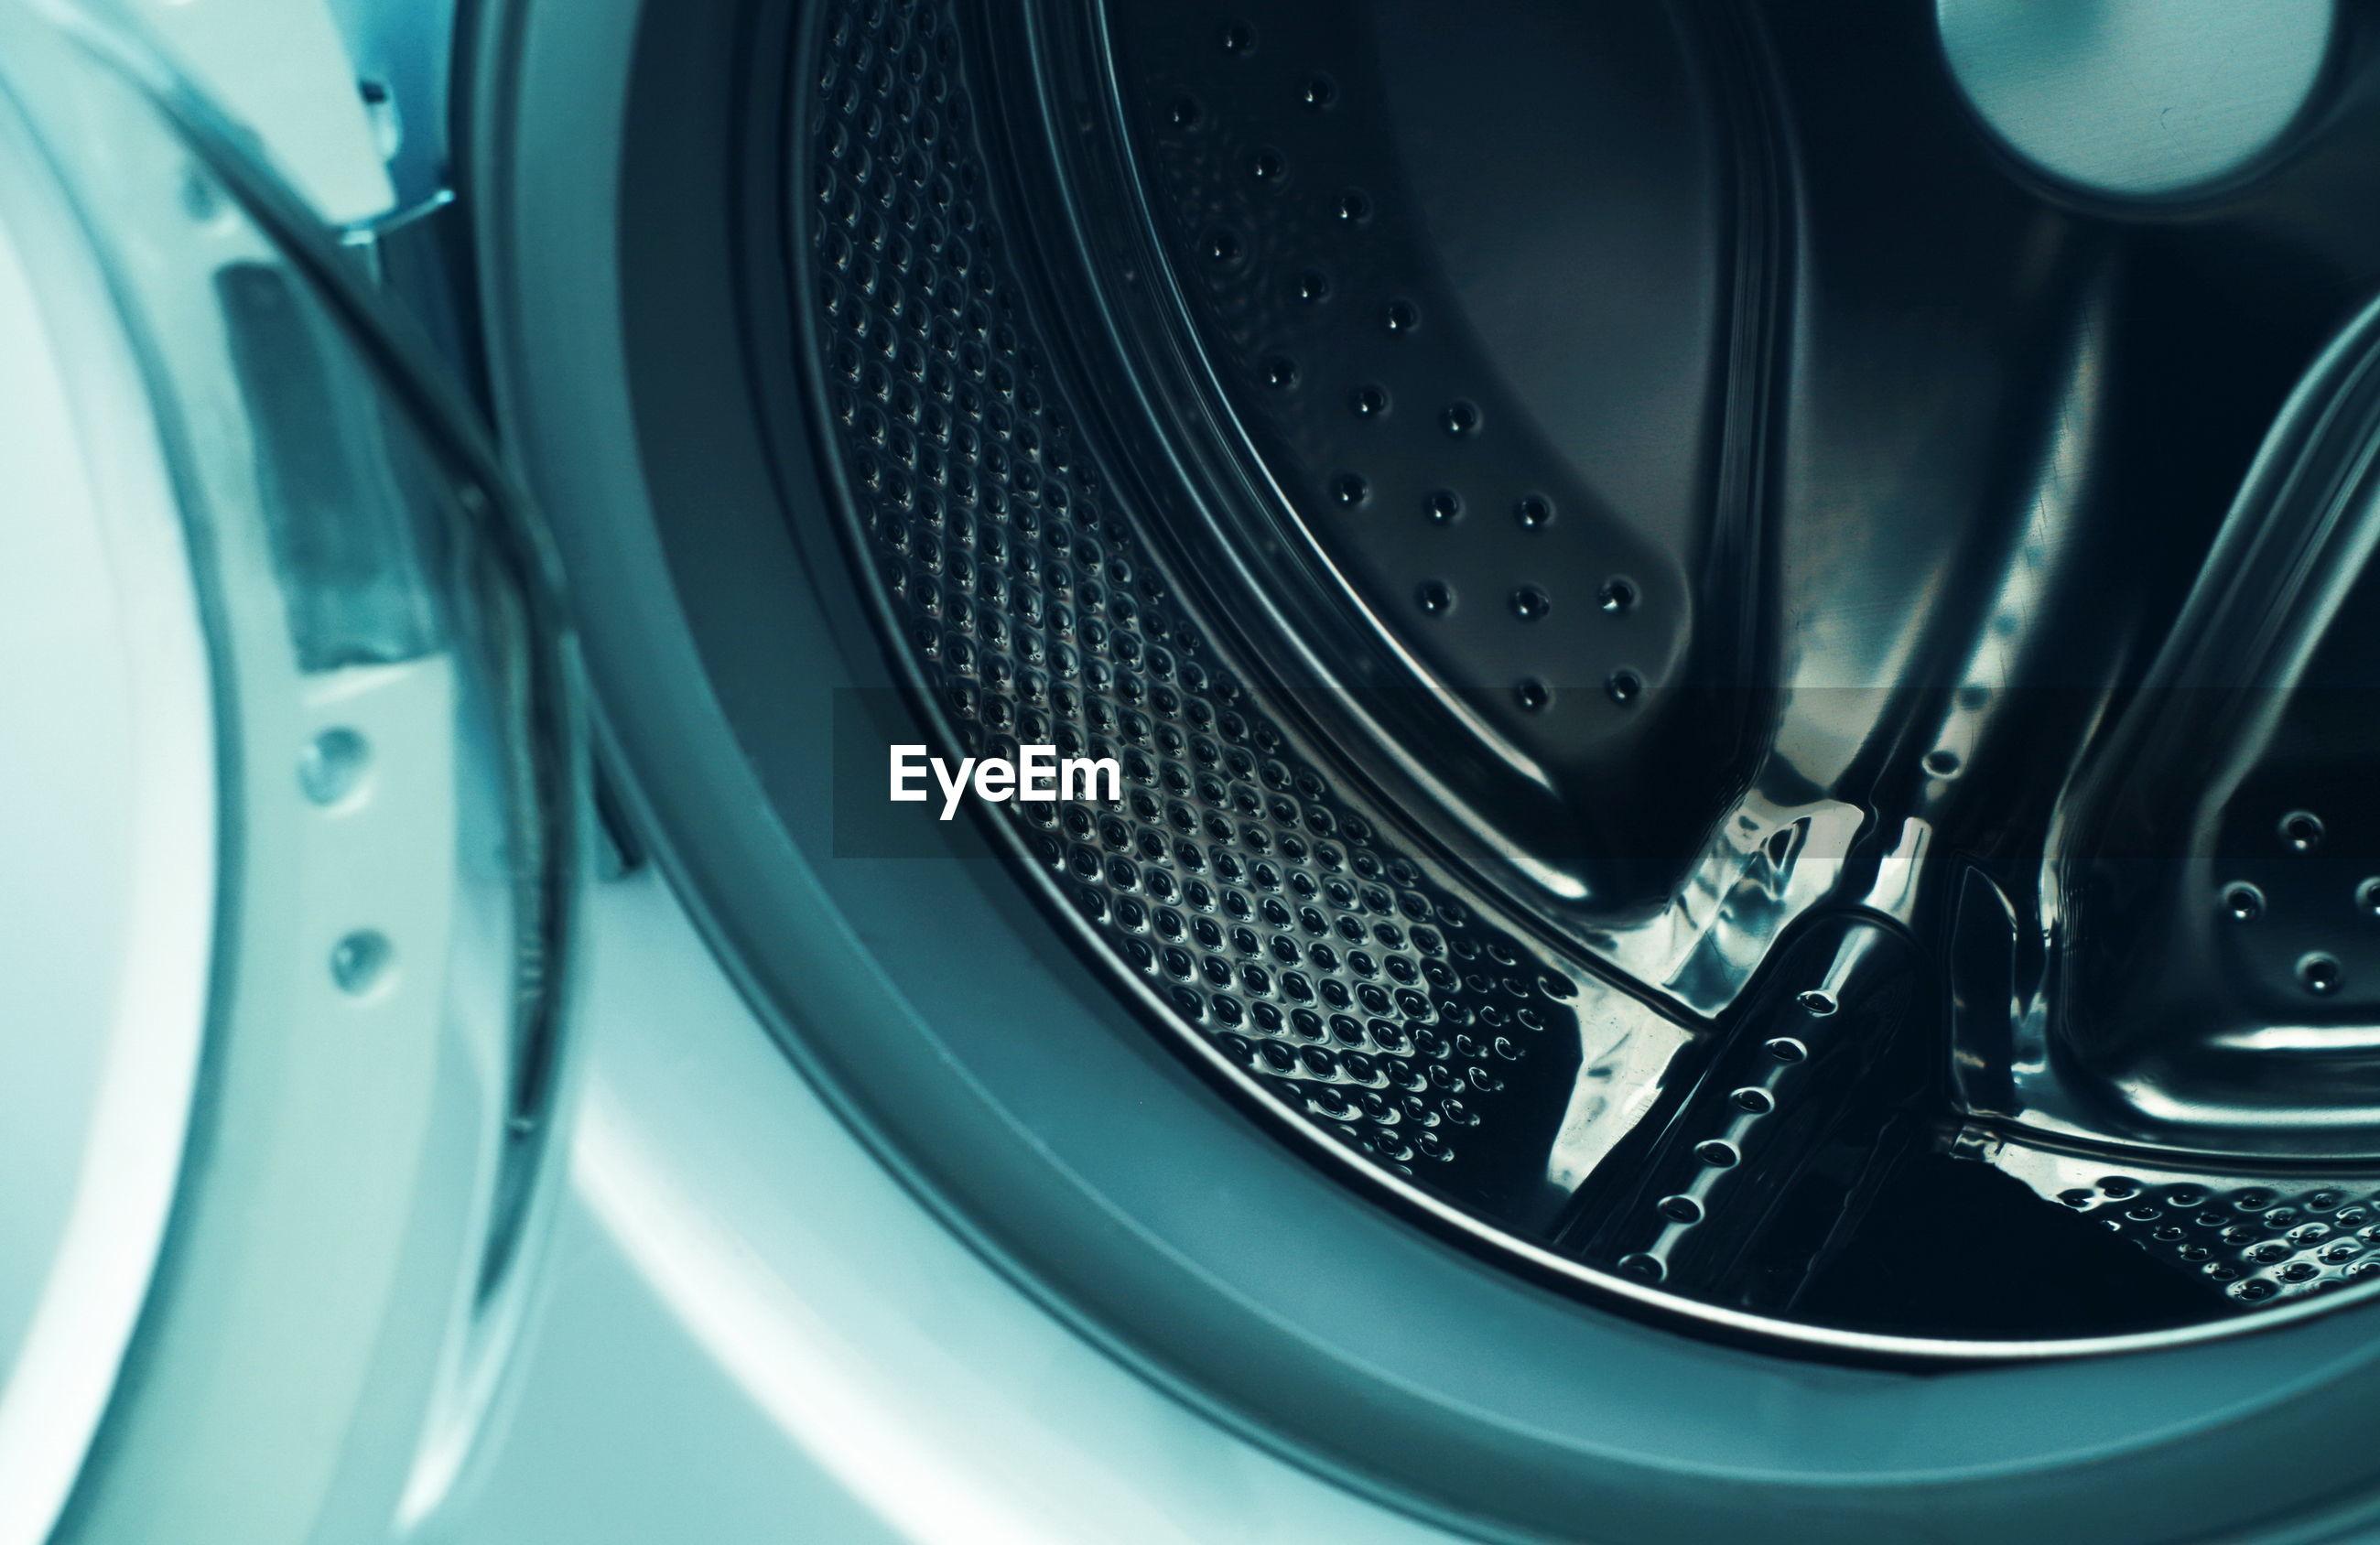 Close-up of washing machine at home